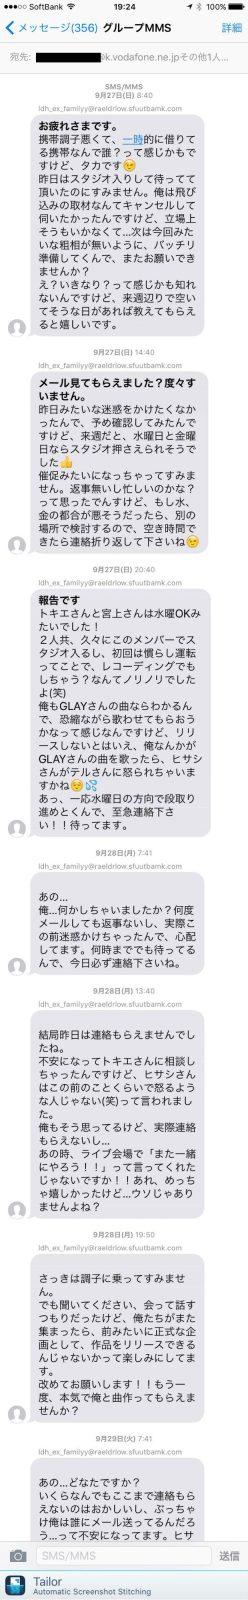 bkm-2016-04-08 - 1 (1)